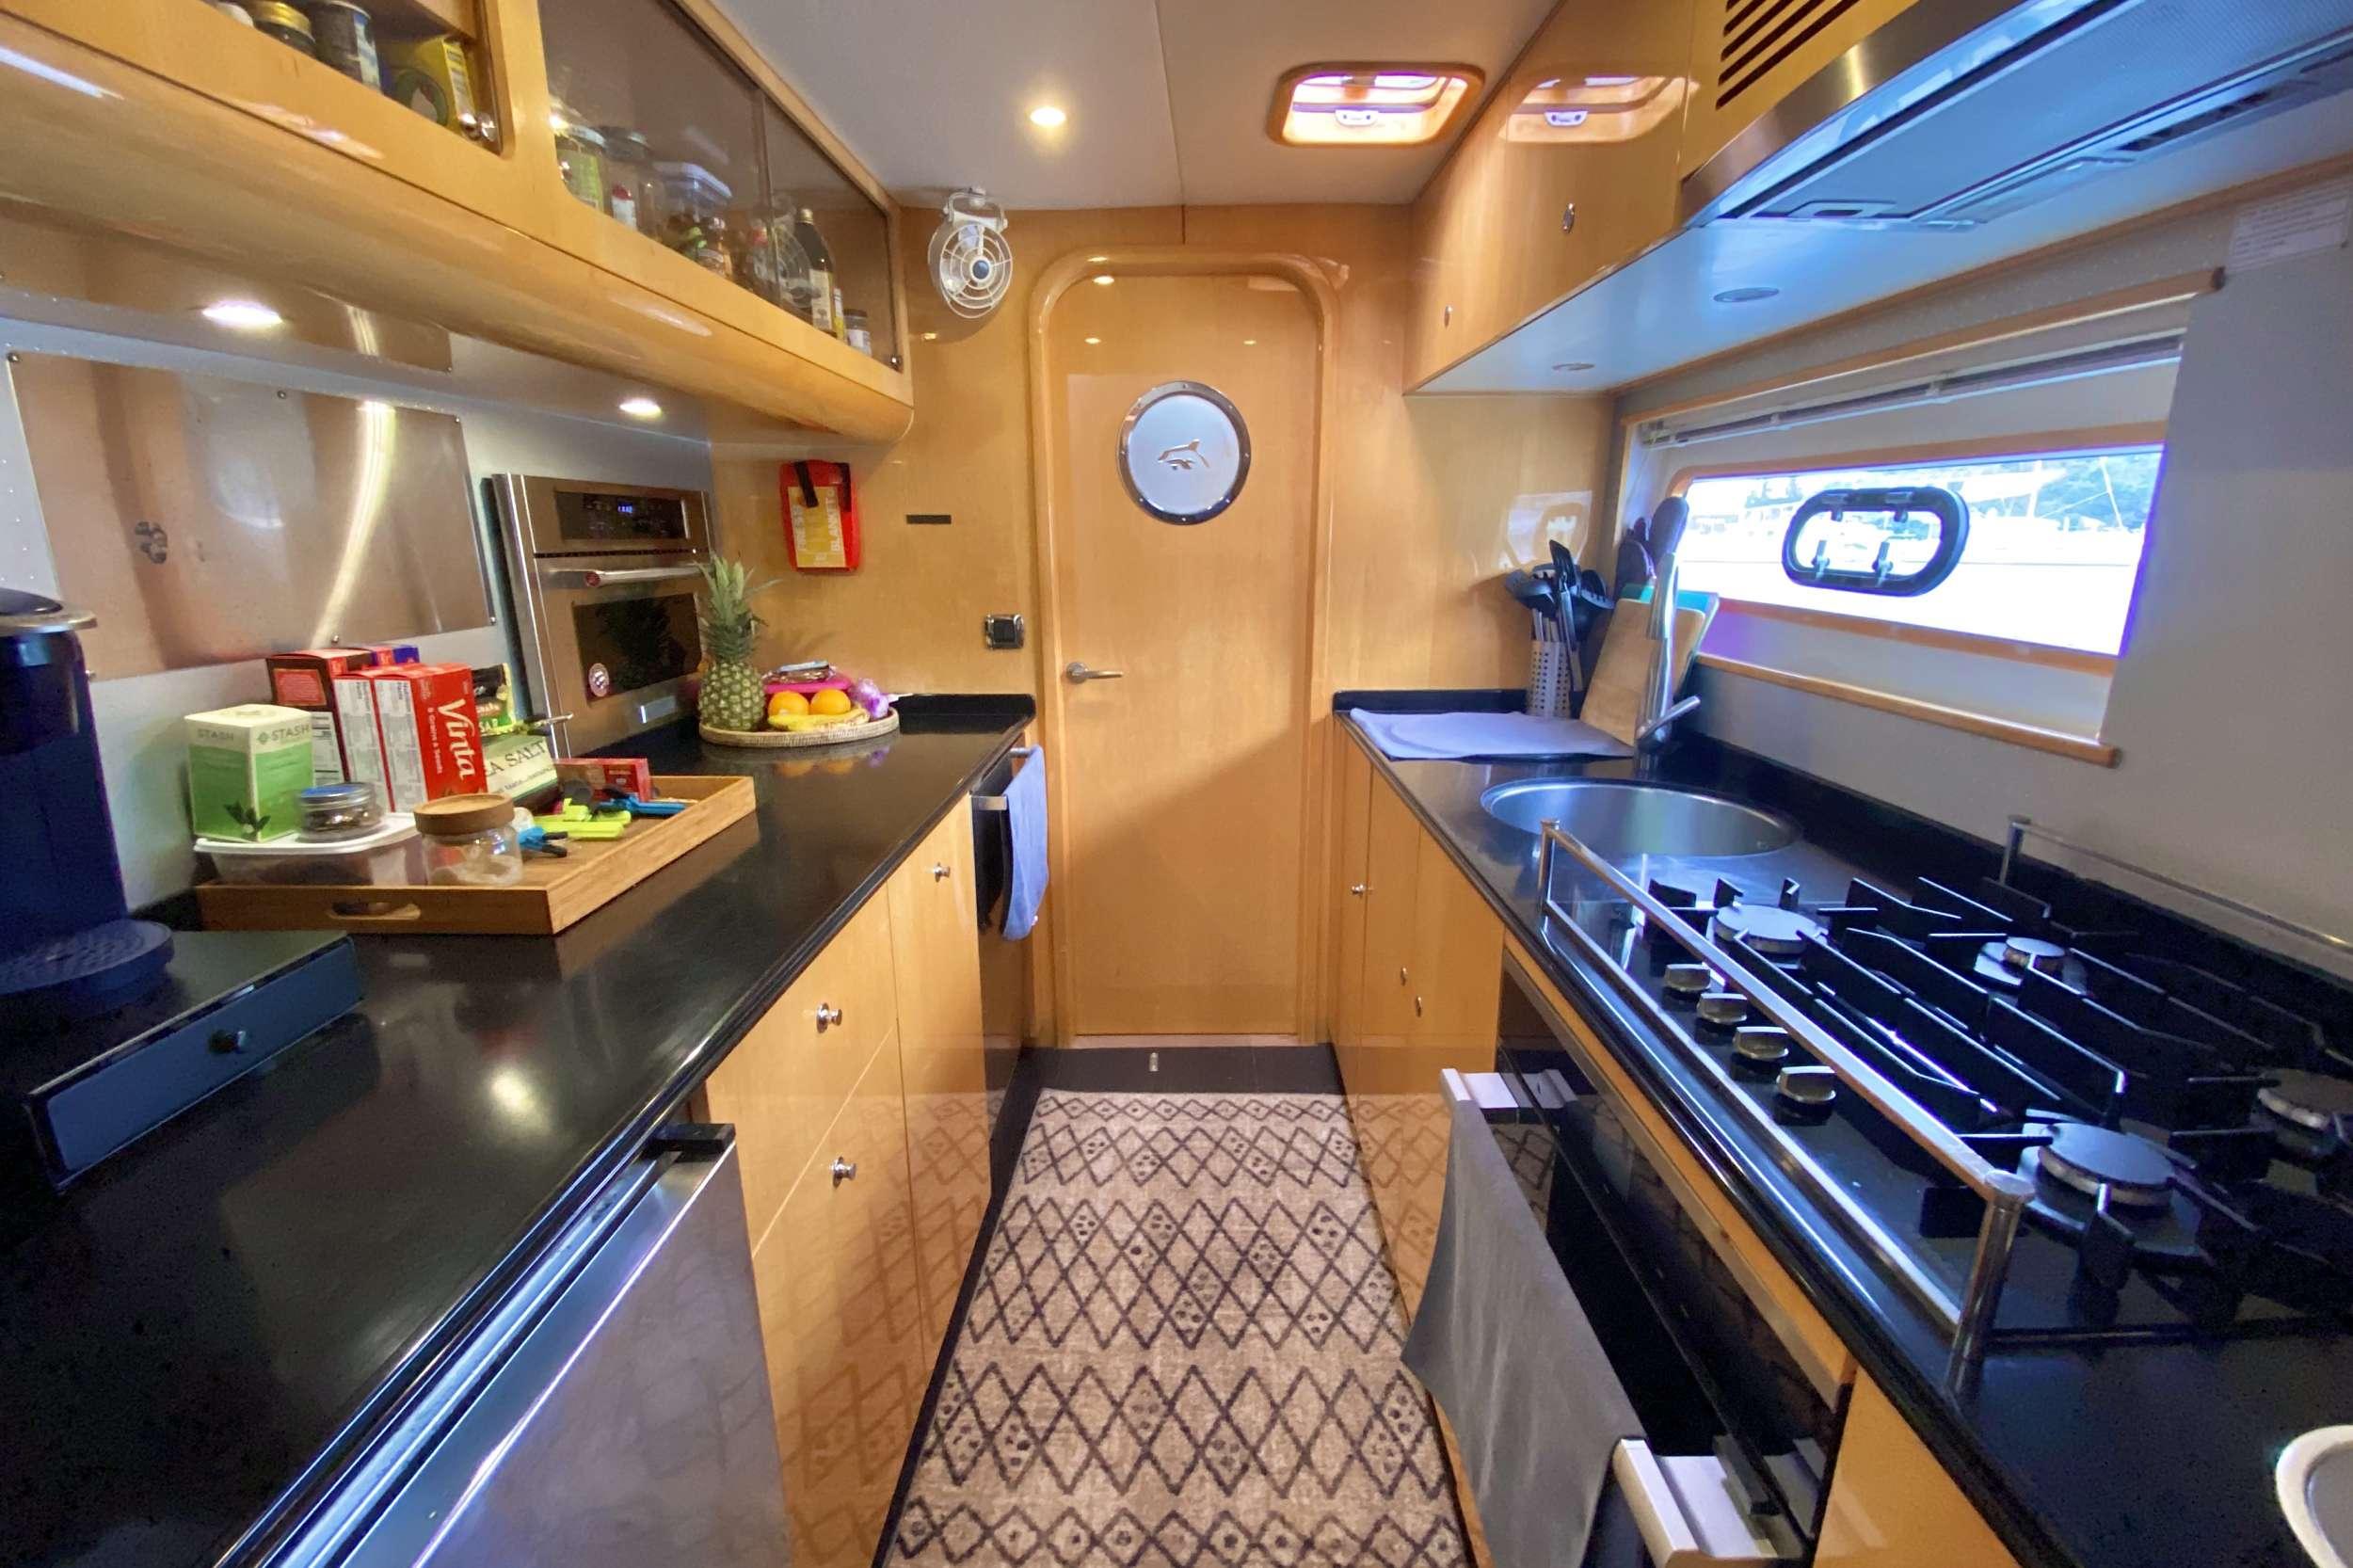 TRES SUENOS yacht image # 2